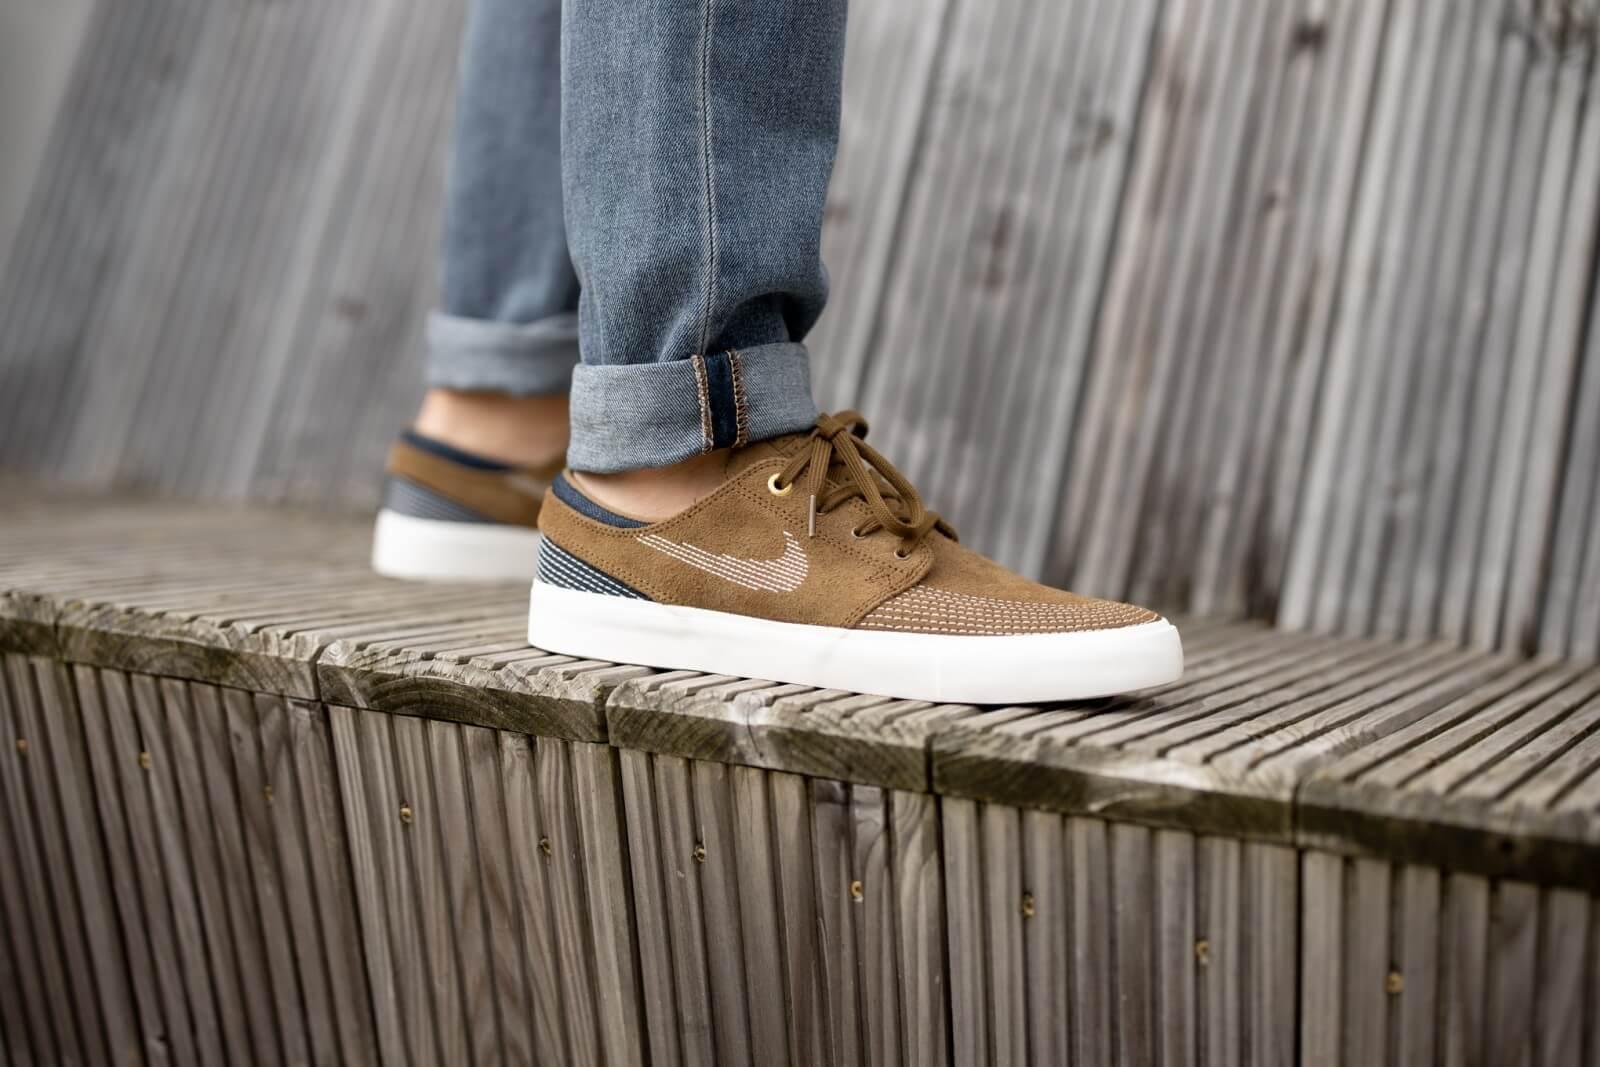 Nike SB Zoom Janoski RM Premium Yukon Brown/Sail-Mystic Navy